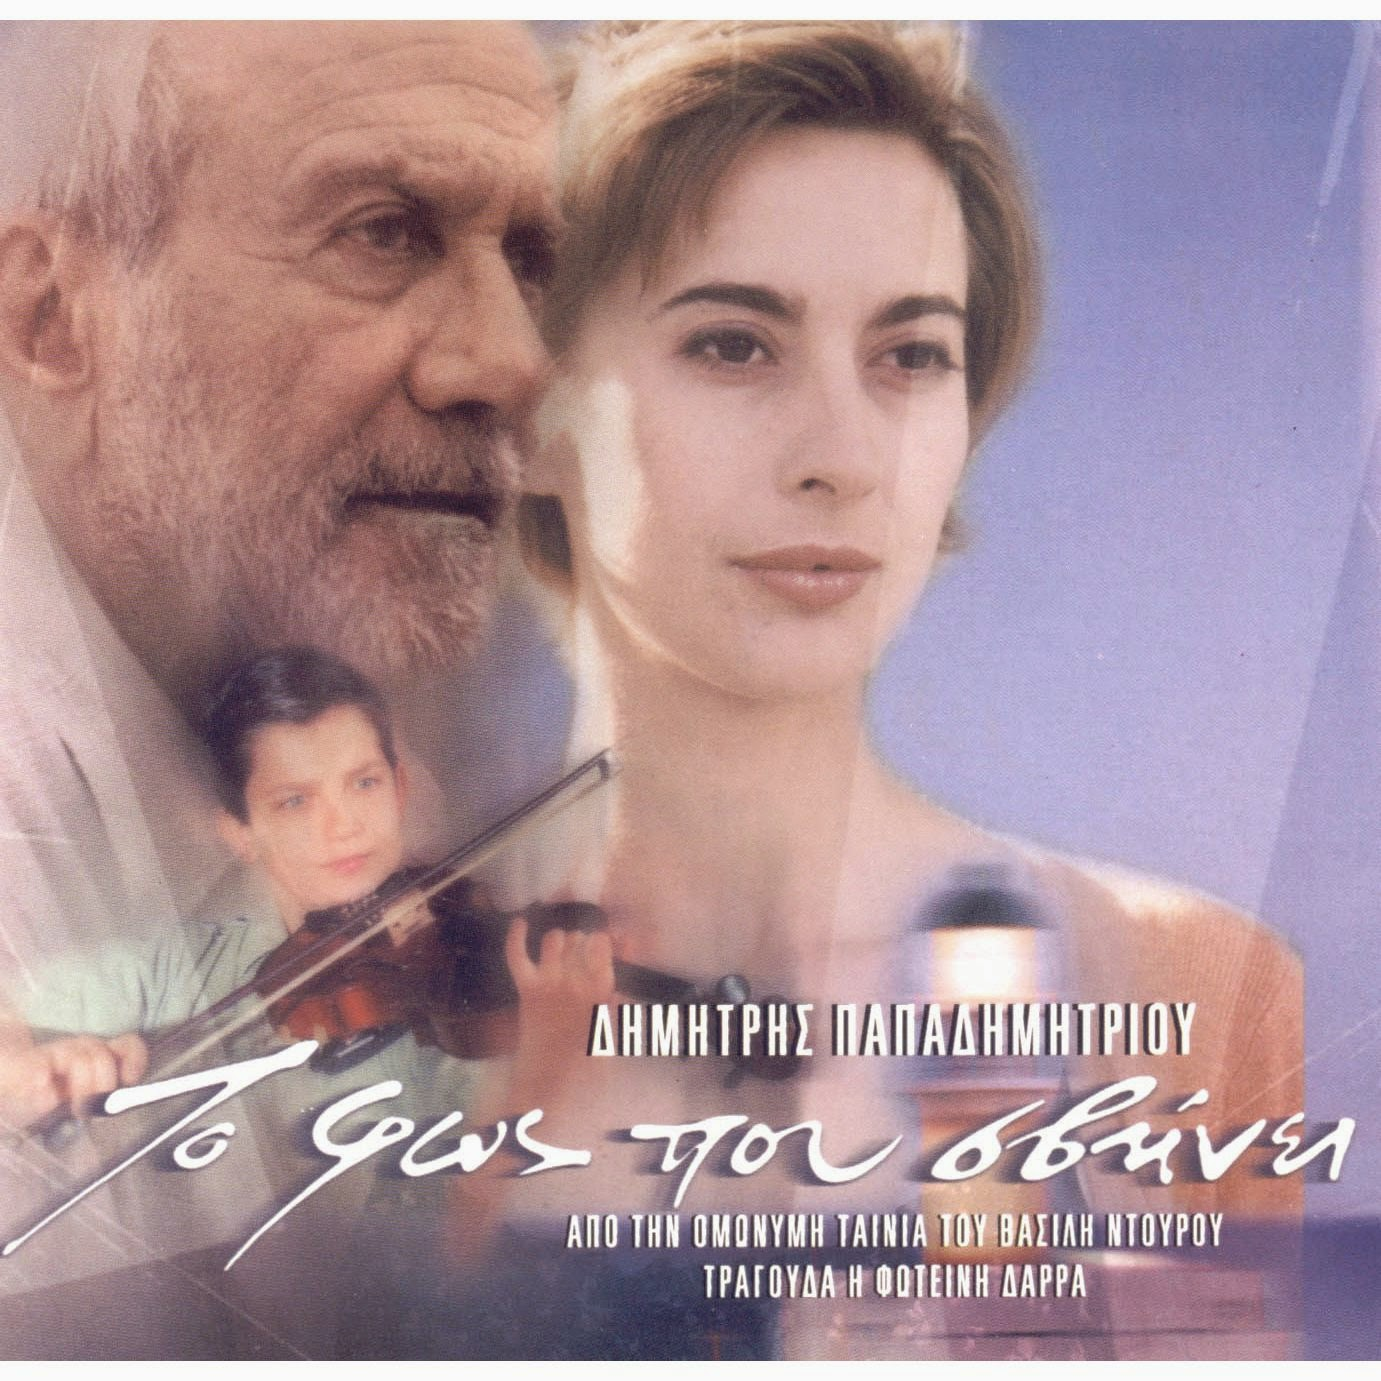 To fos pou svinei - Το φως που σβήνει (2000) ταινιες online seires xrysoi greek subs